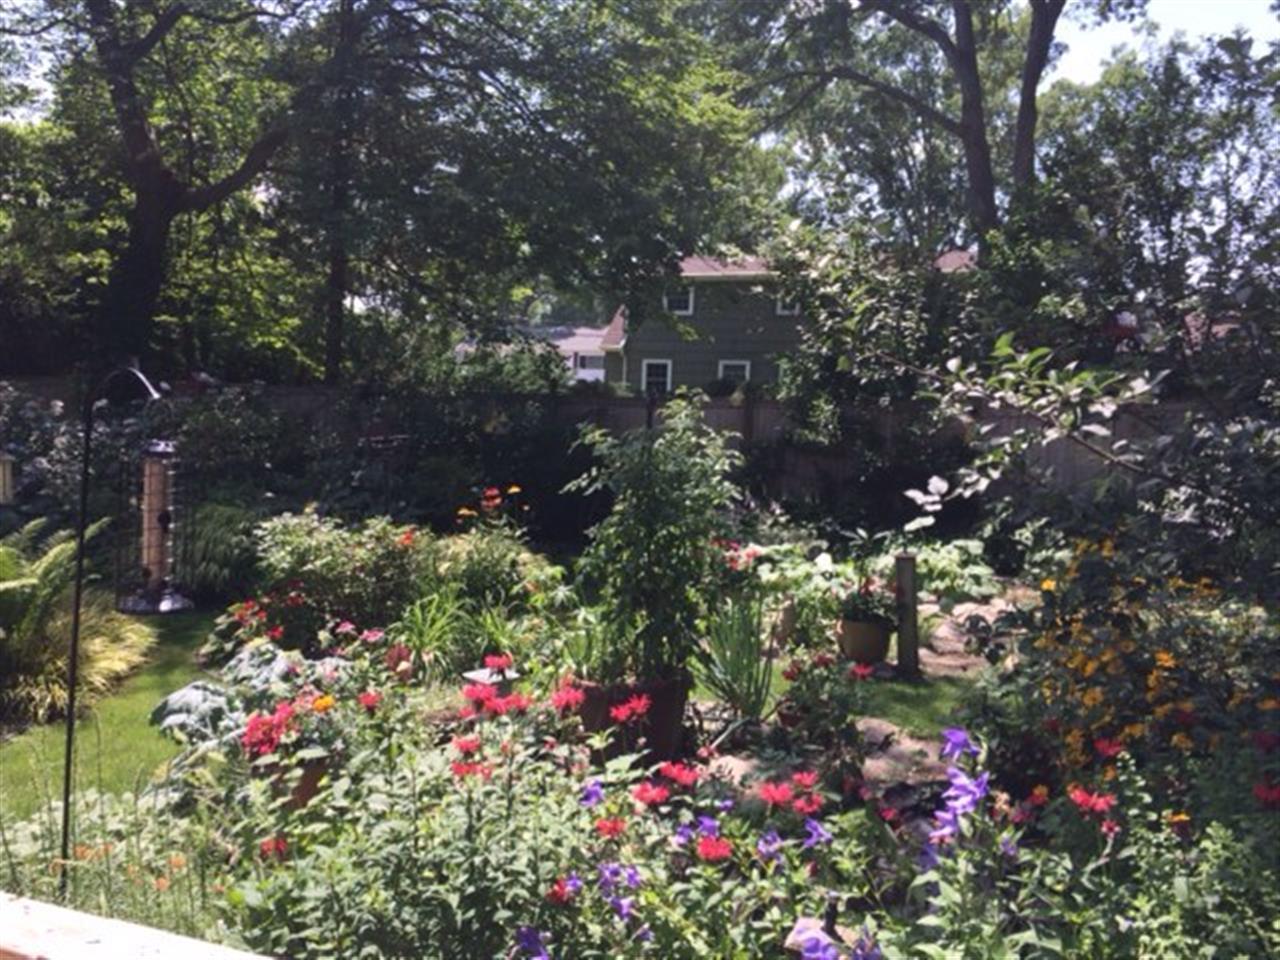 #IreneLockel #NetterRealEstate #LeadingRelocal #Beautiful #Flowers #NetterLovesTheBeauty #LandscapingAtItsFinest #BrightWaters #SouthShore #LongIsland #Nature #BeautifulBackyard